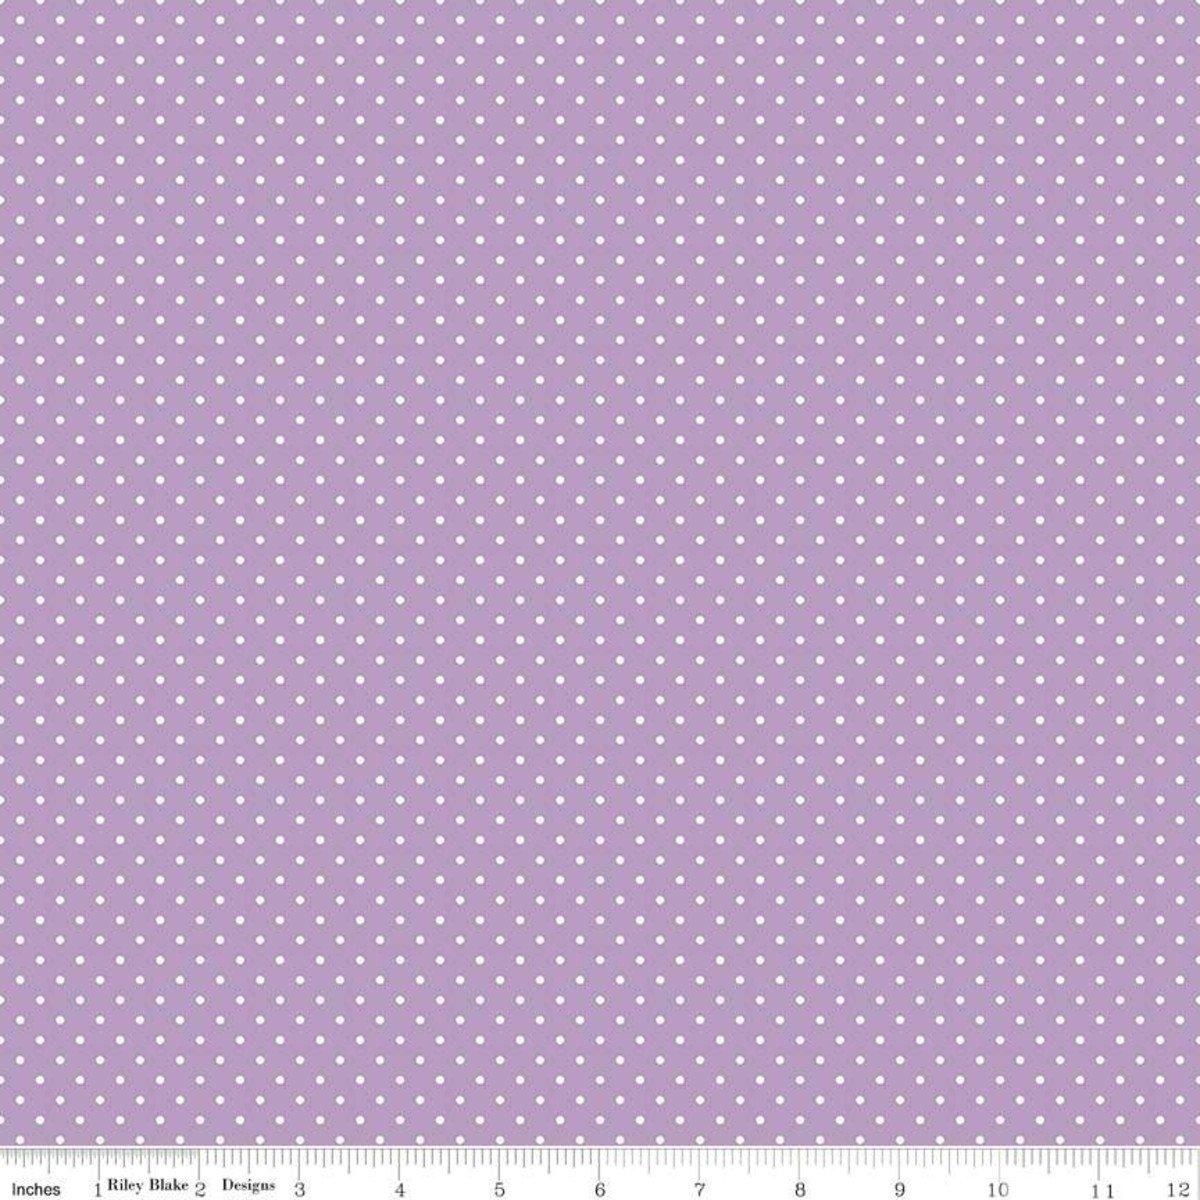 Swiss Dots in Lavender